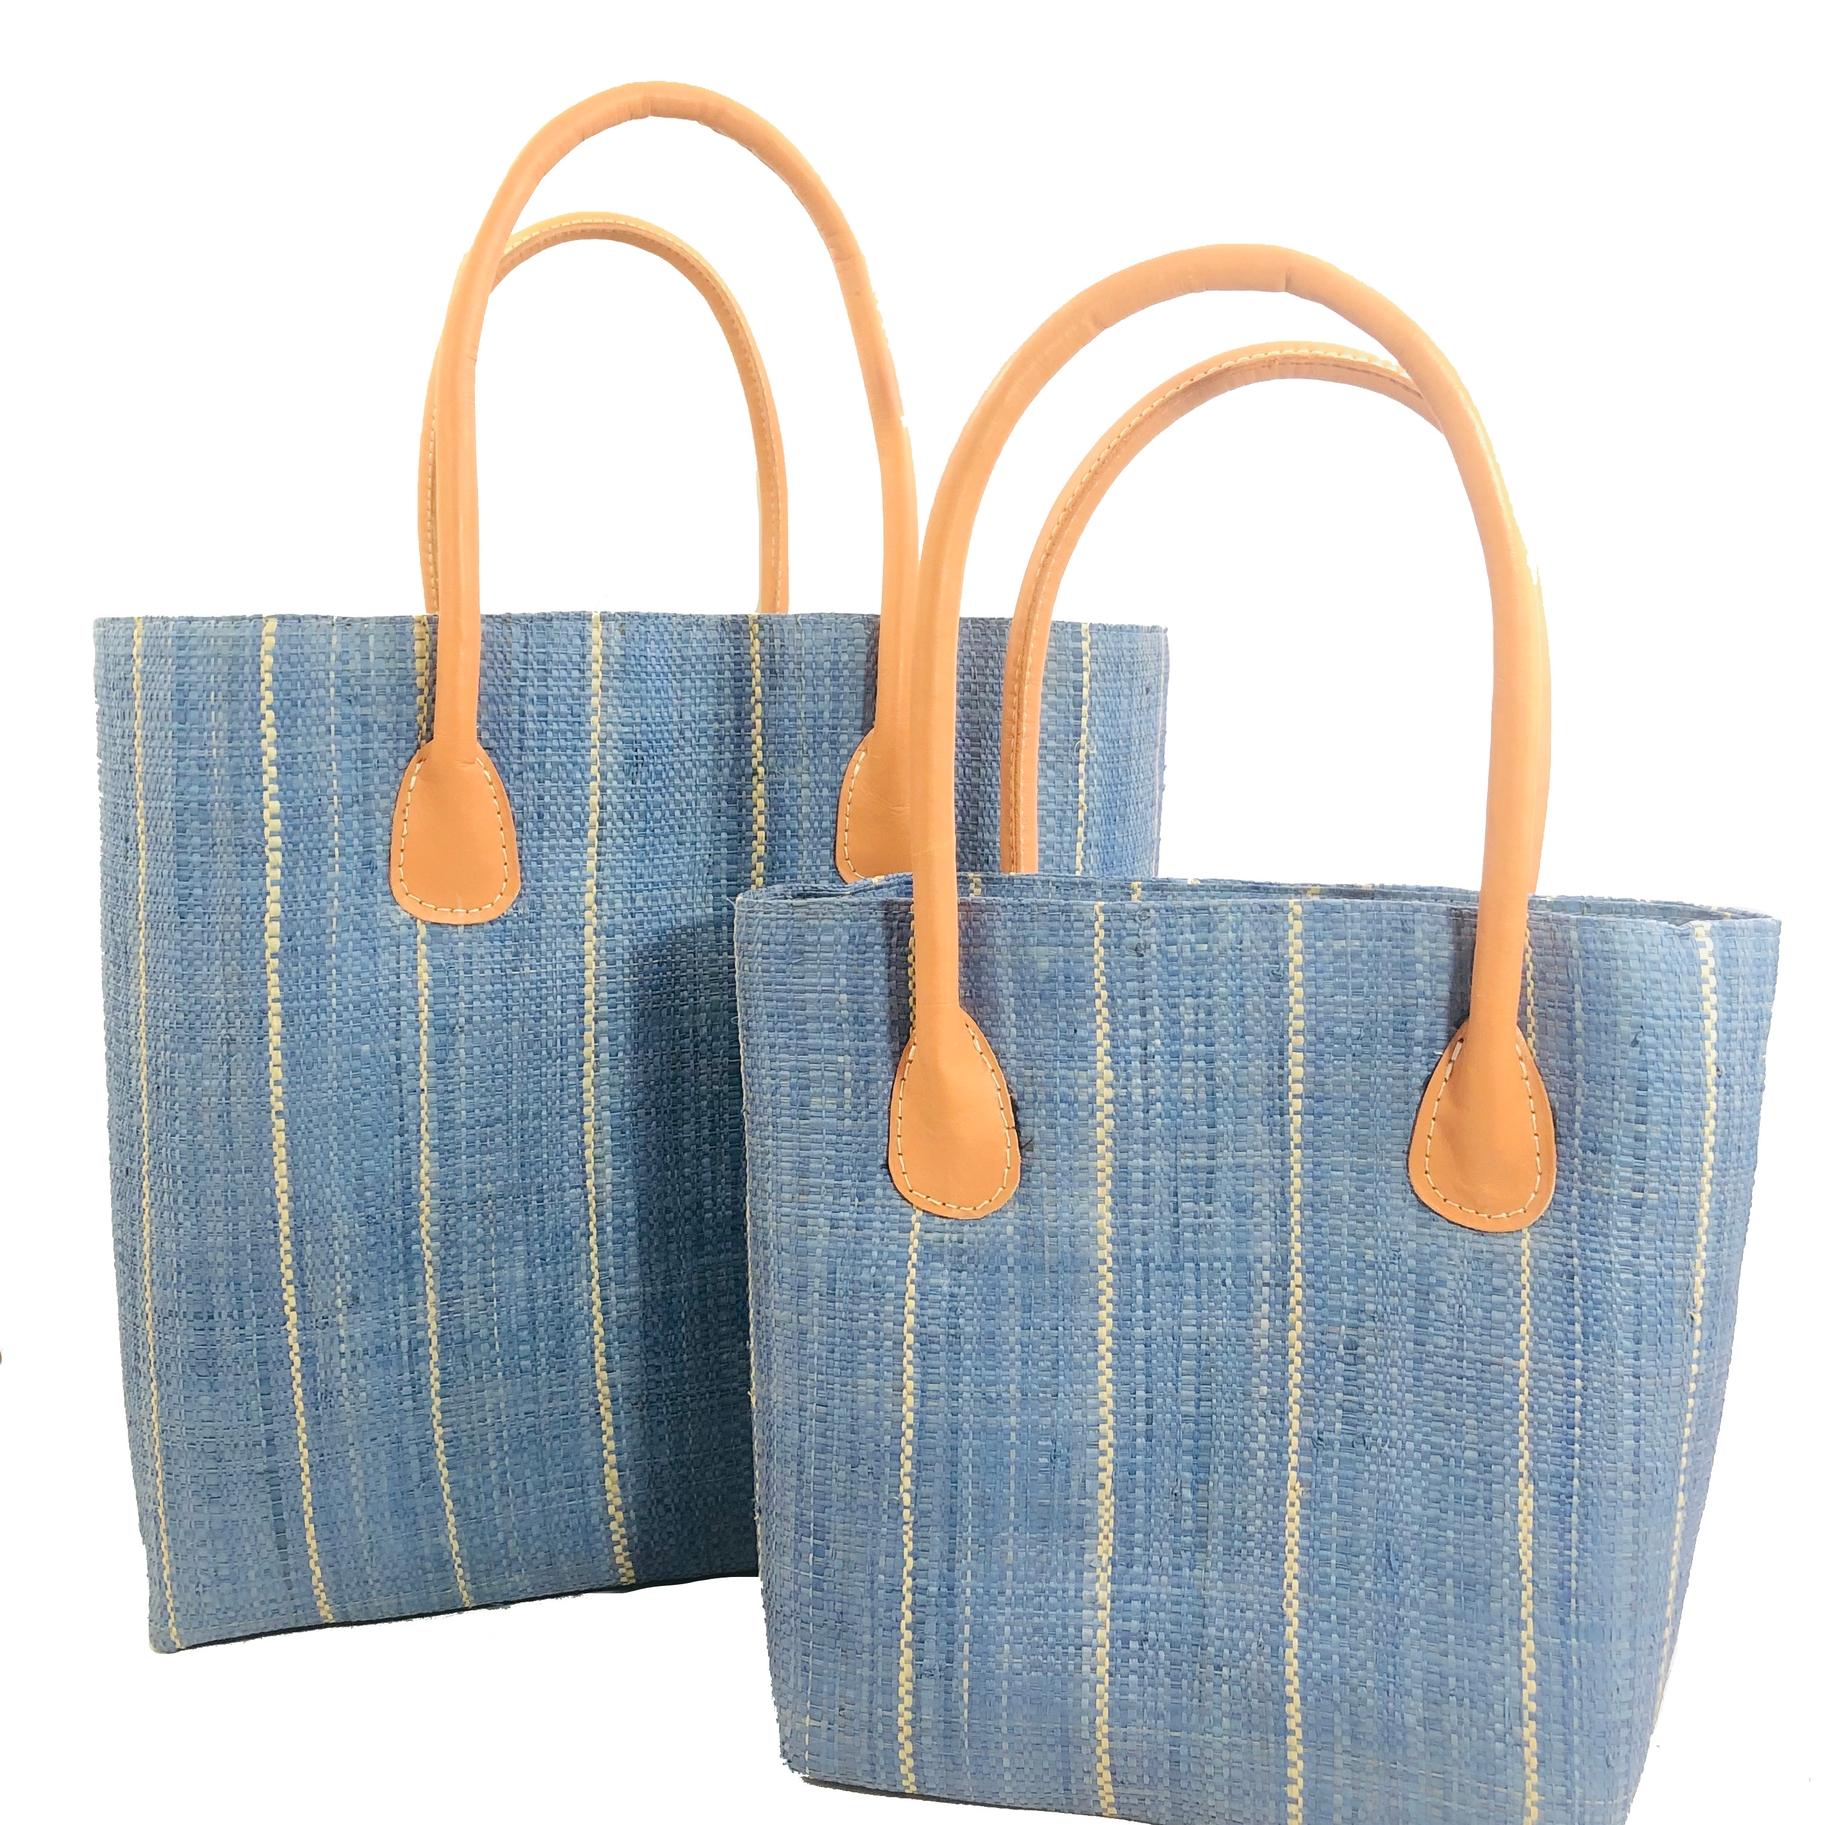 Soubic Pin Stripes Basket - Cornflower | Trada Marketplace